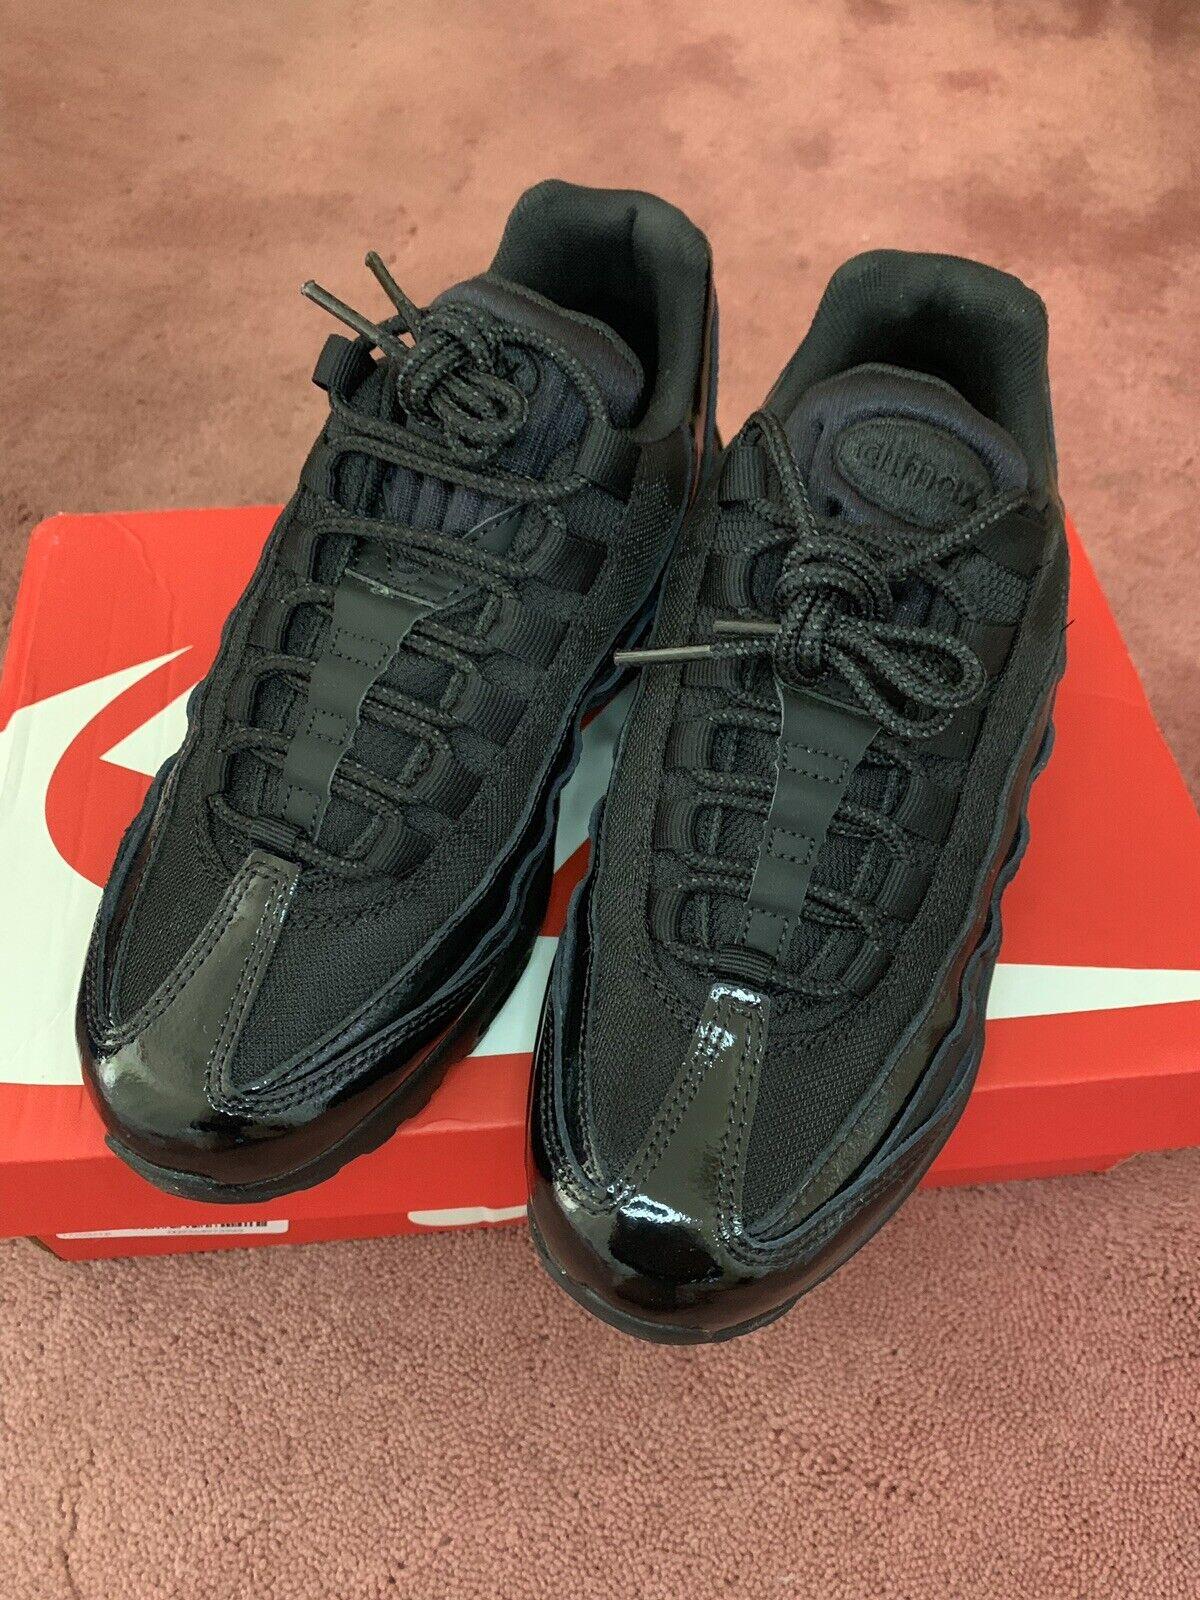 Nike Air Max 95 UK 4 nuevo embalaje